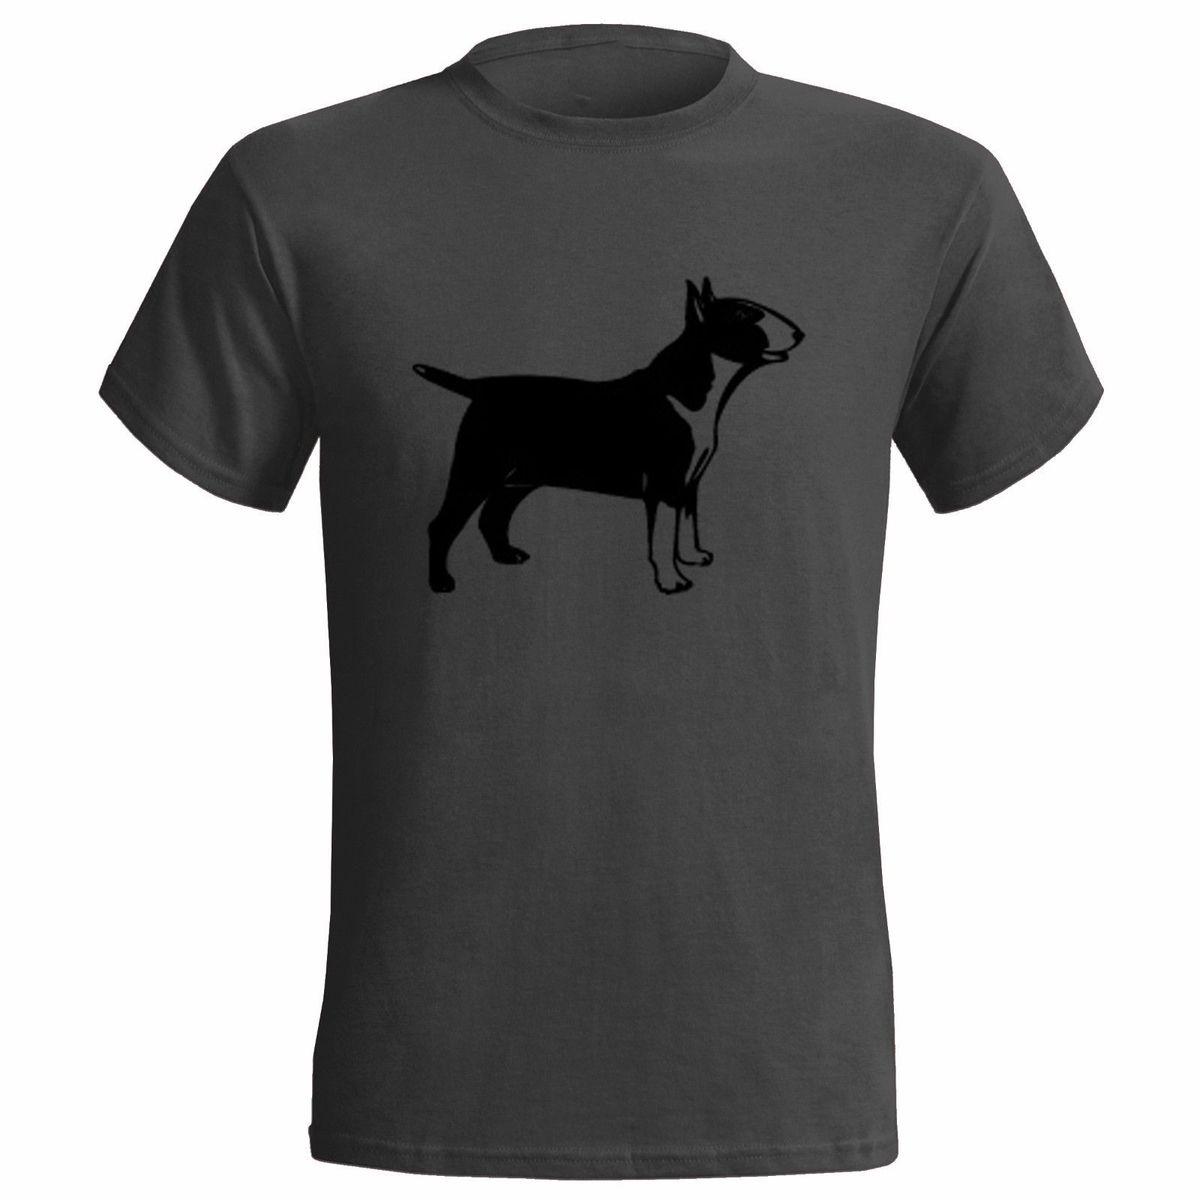 ENGLISH BULL TERRIER VECTOR ART MENS T SHIRT DOG DOGS PRESENT GIFT CANINE PET